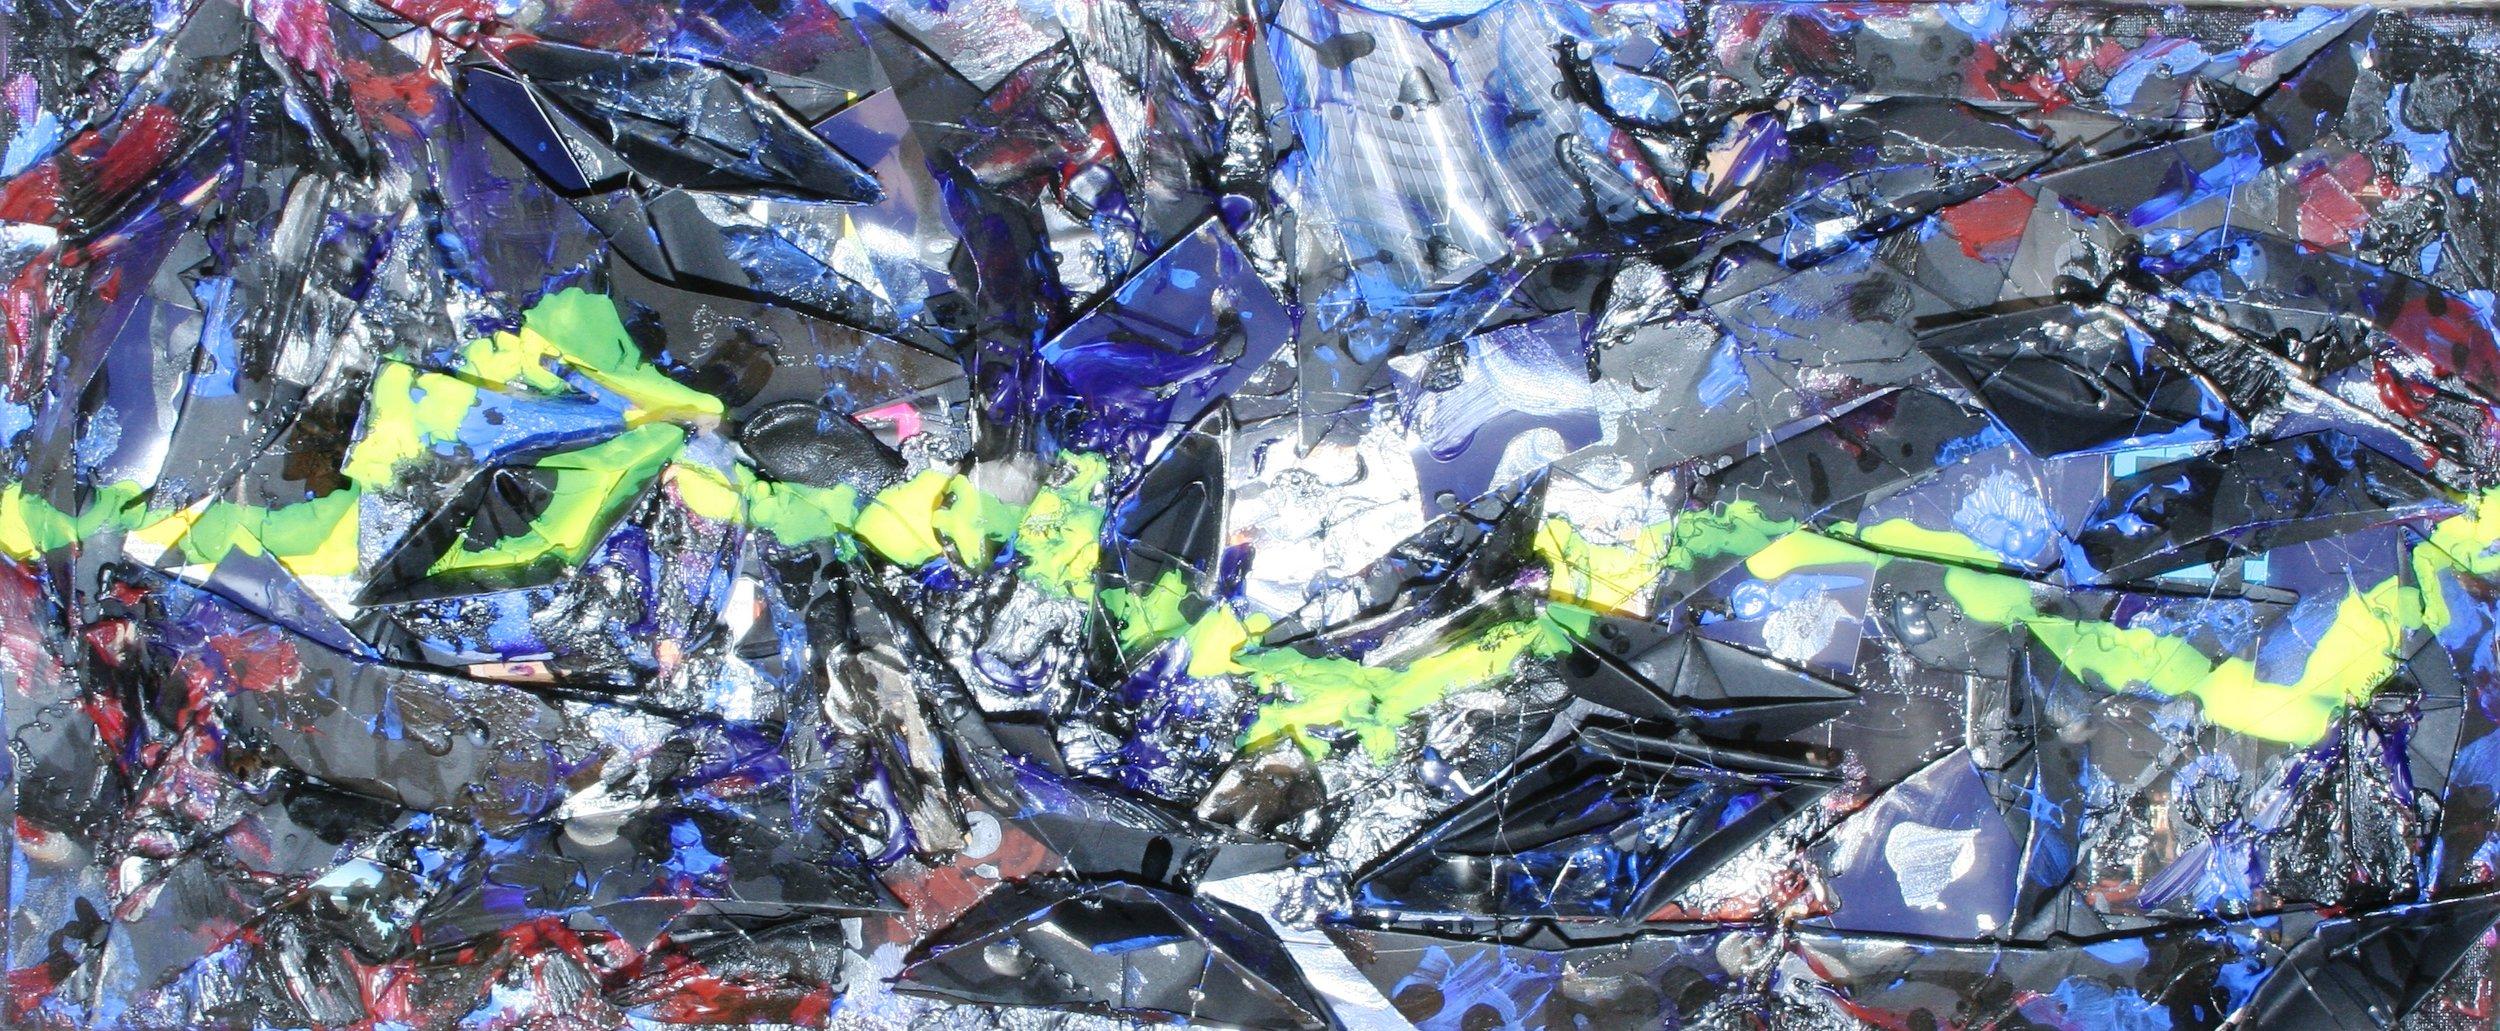 Cajun moon, sunken boat (black)  2010 Mixed media on canvas 70 x 30cm